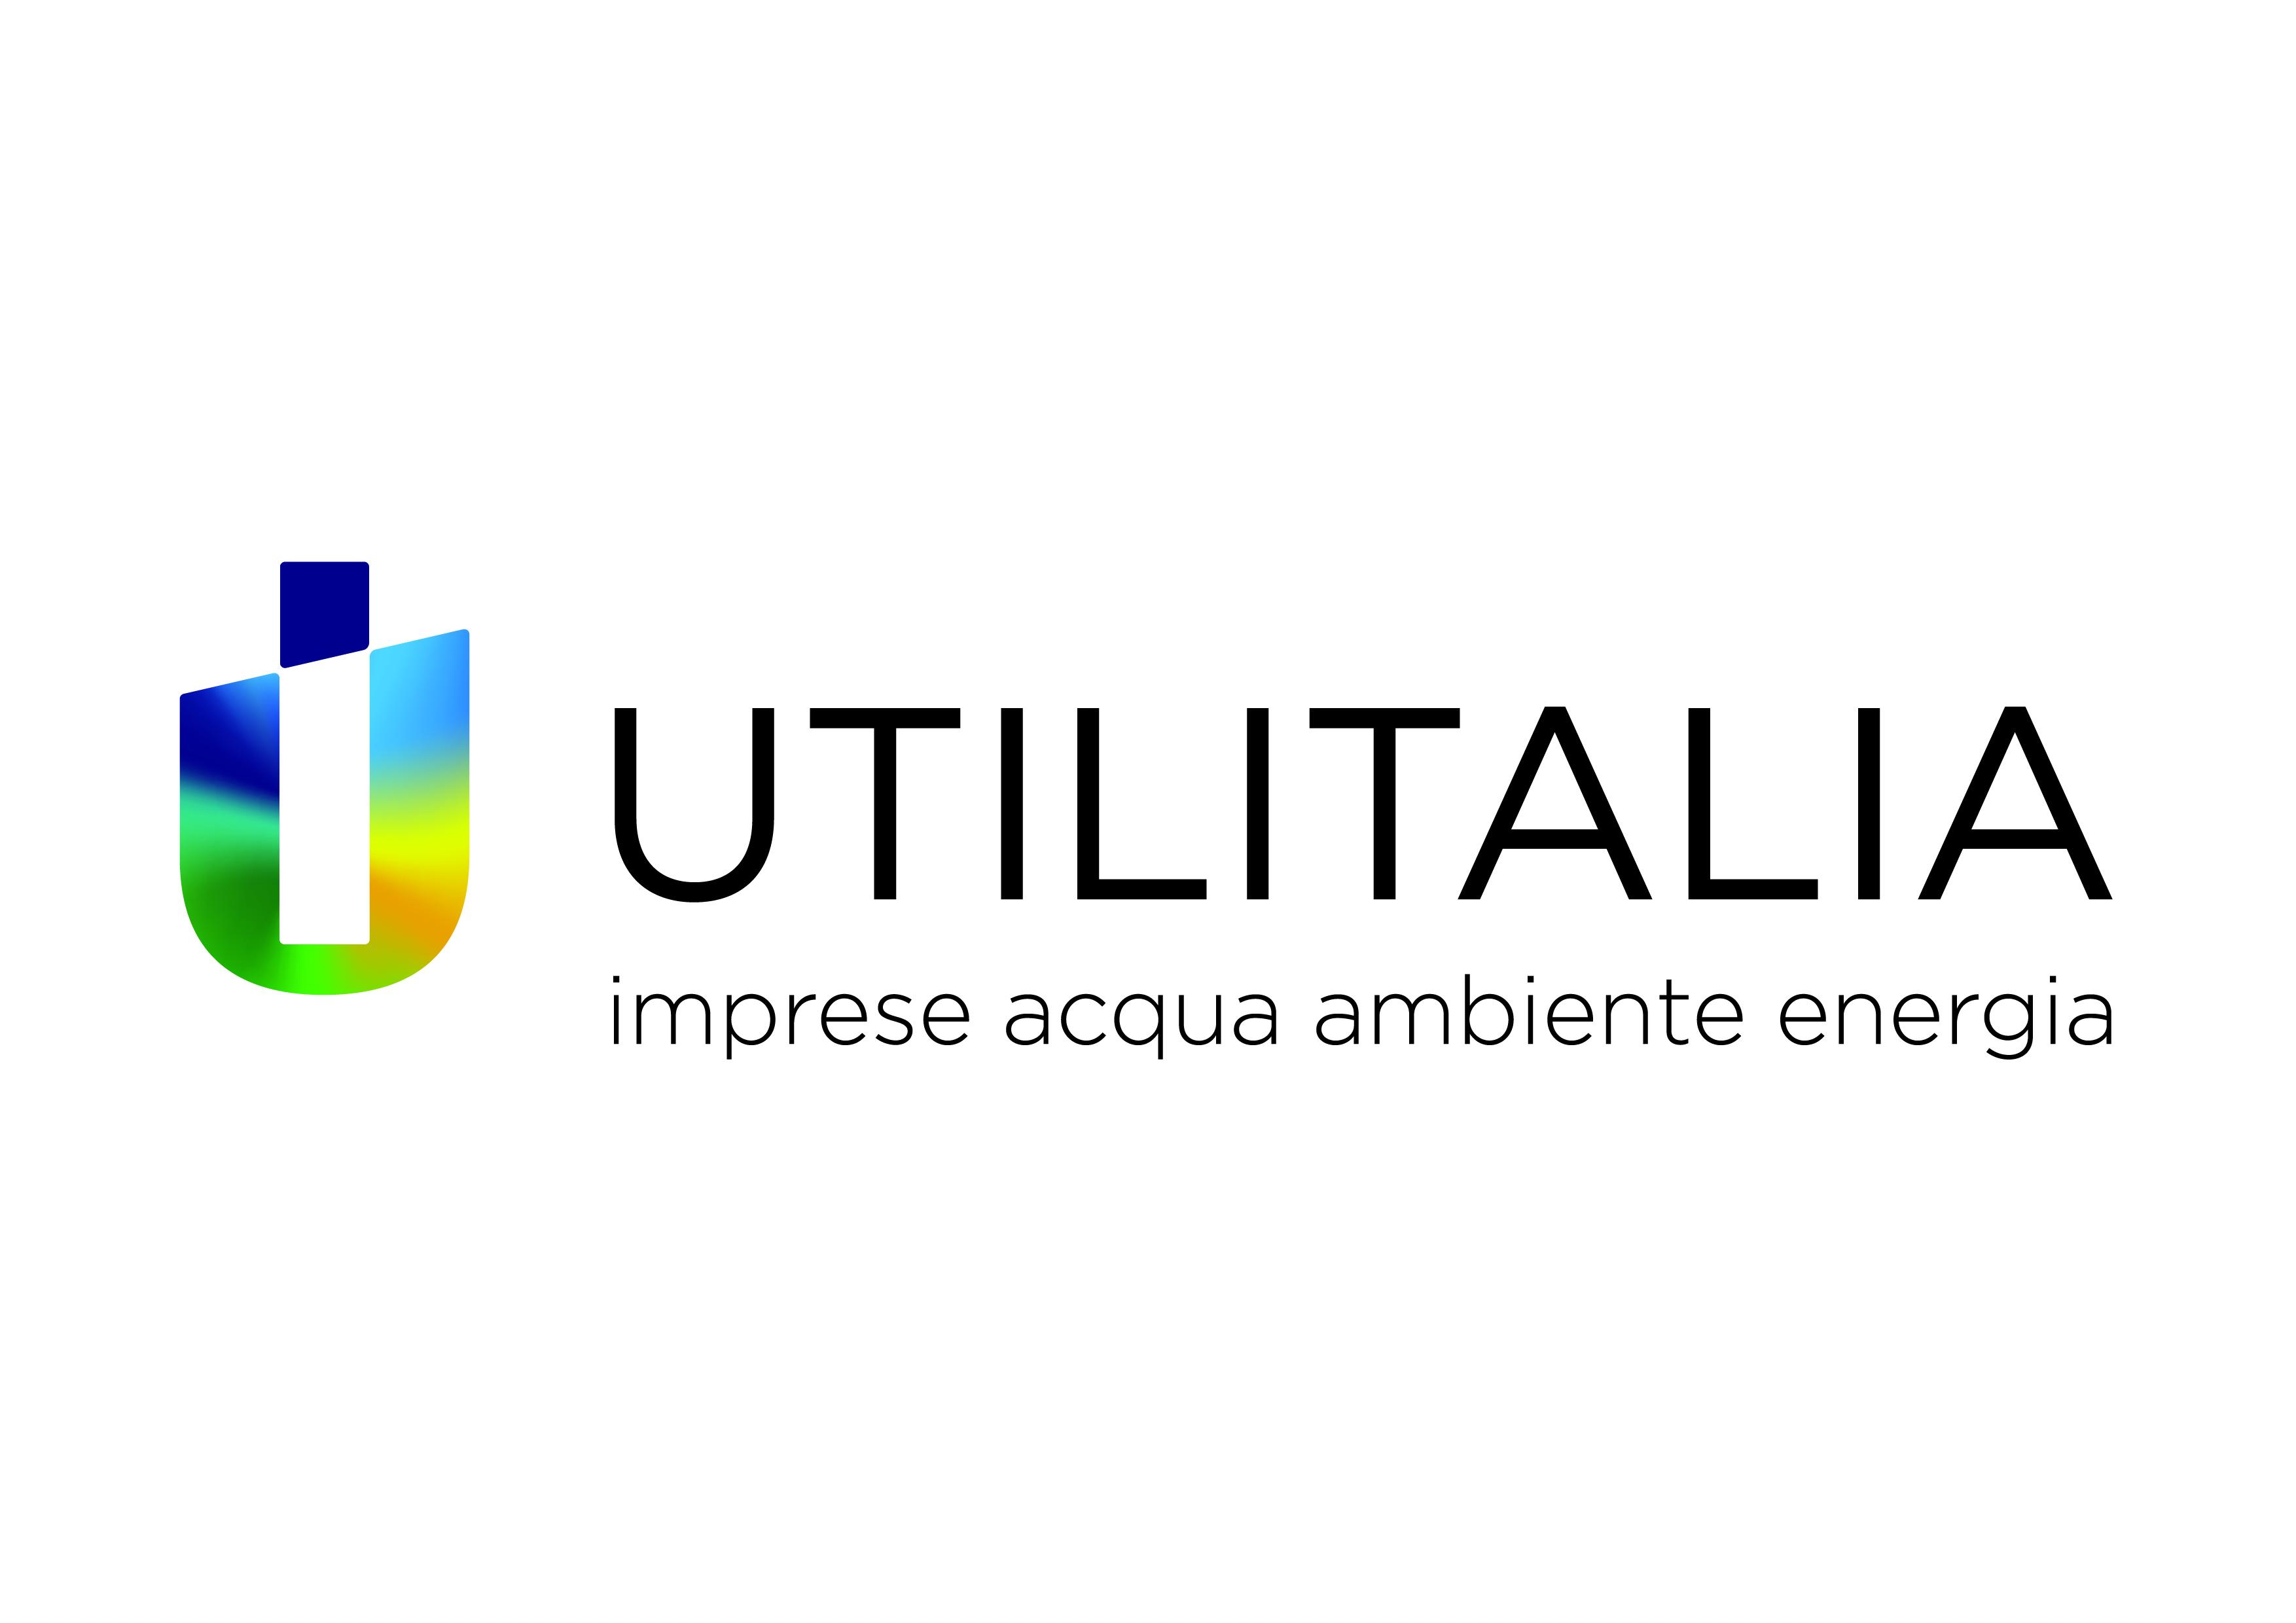 utilitalia-logo.jpg